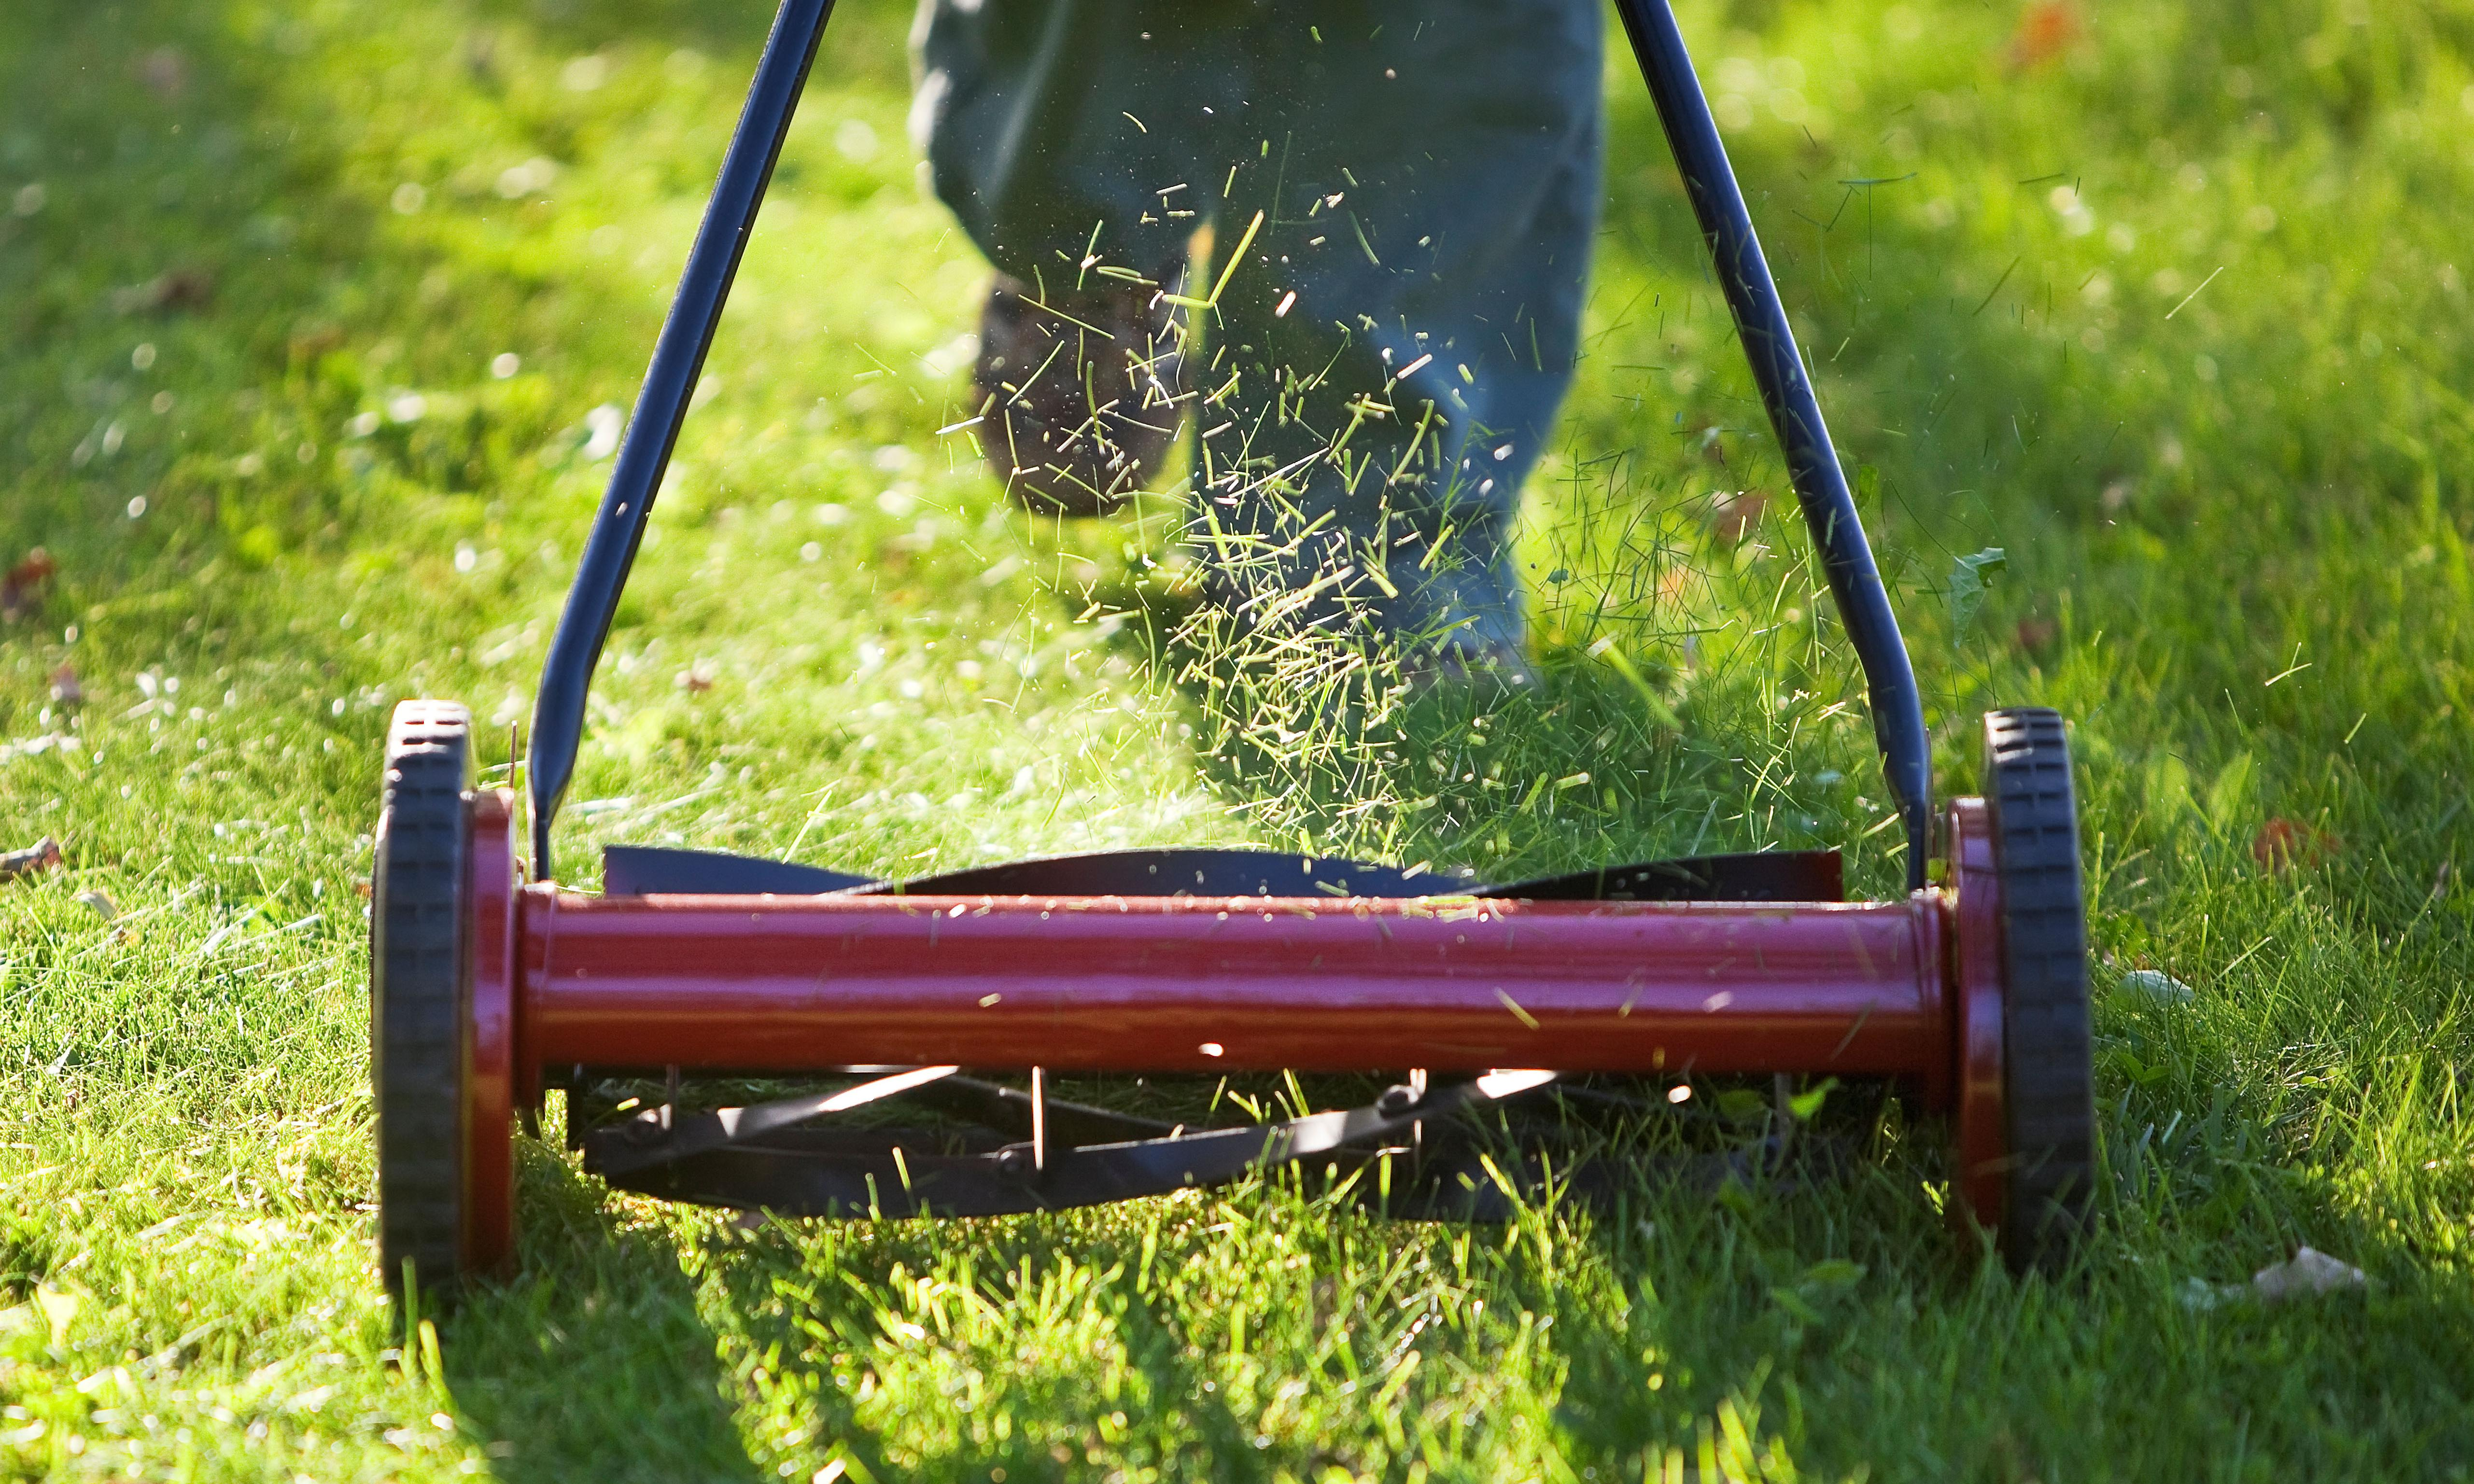 Laying down the Strava gardening gauntlet